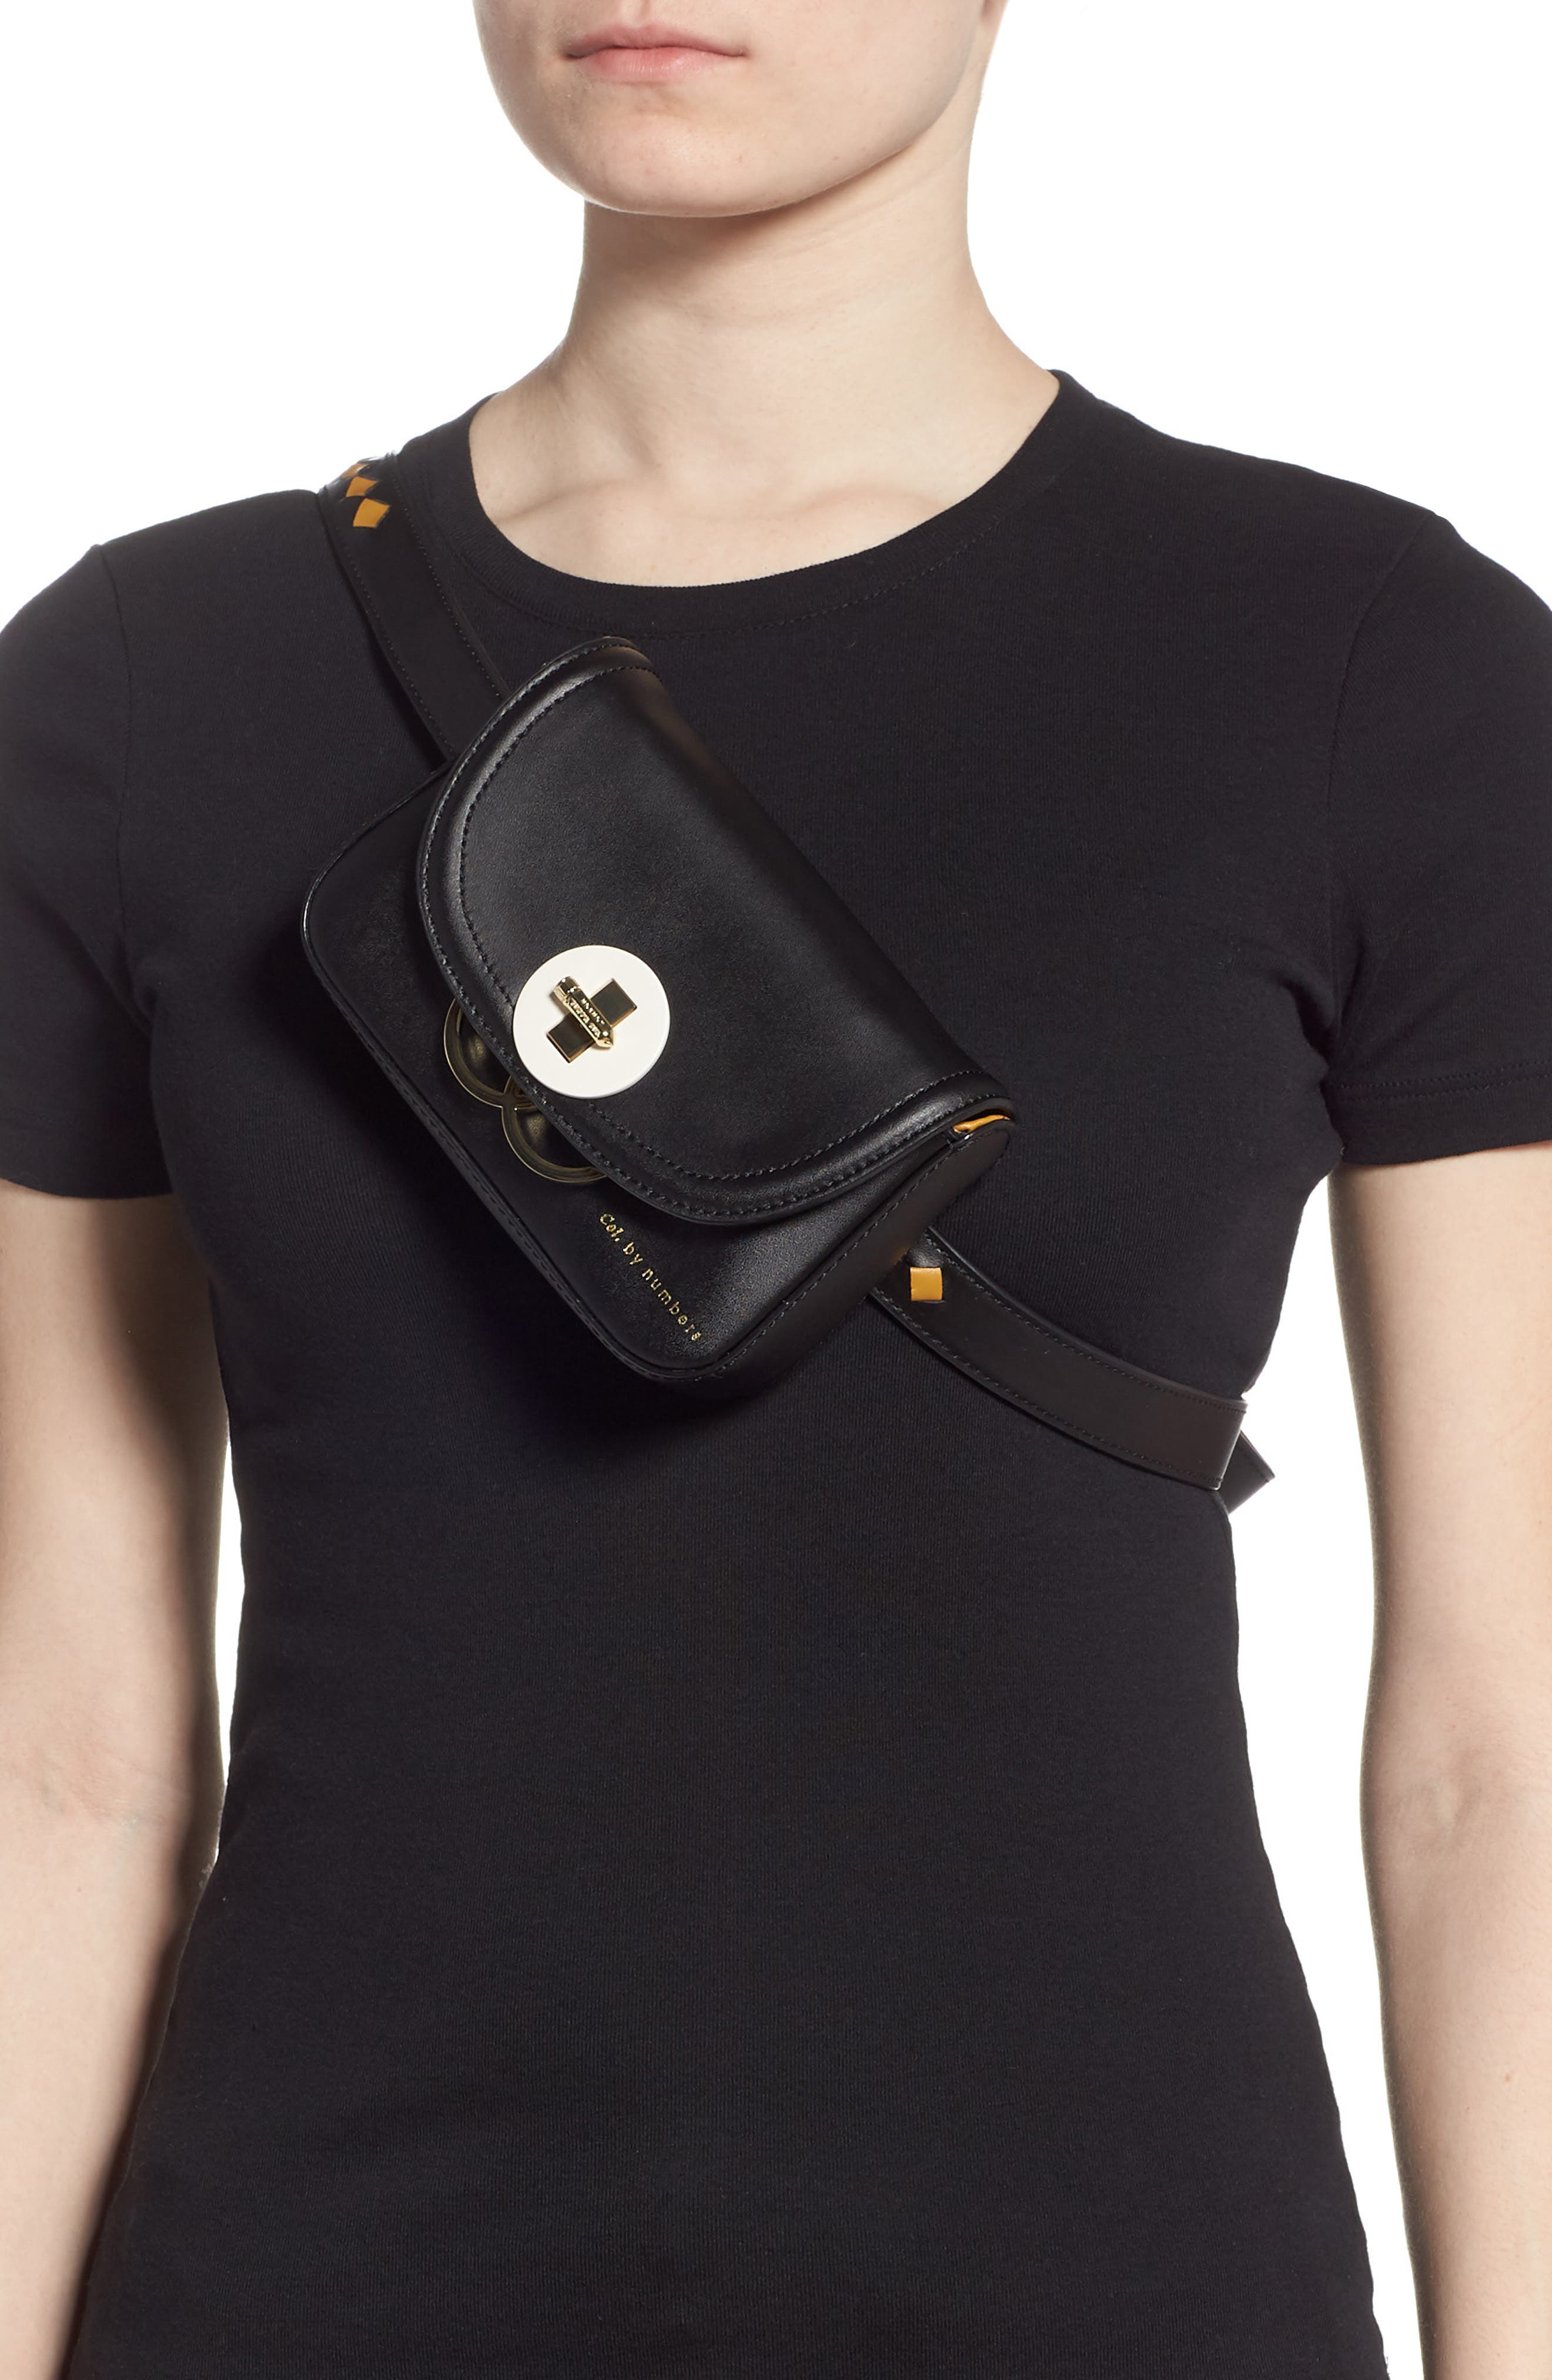 TED BAKER LONDON,                             Colour by Numbers Krakan Leather Belt Bag,                             Alternate thumbnail 4, color,                             BLACK